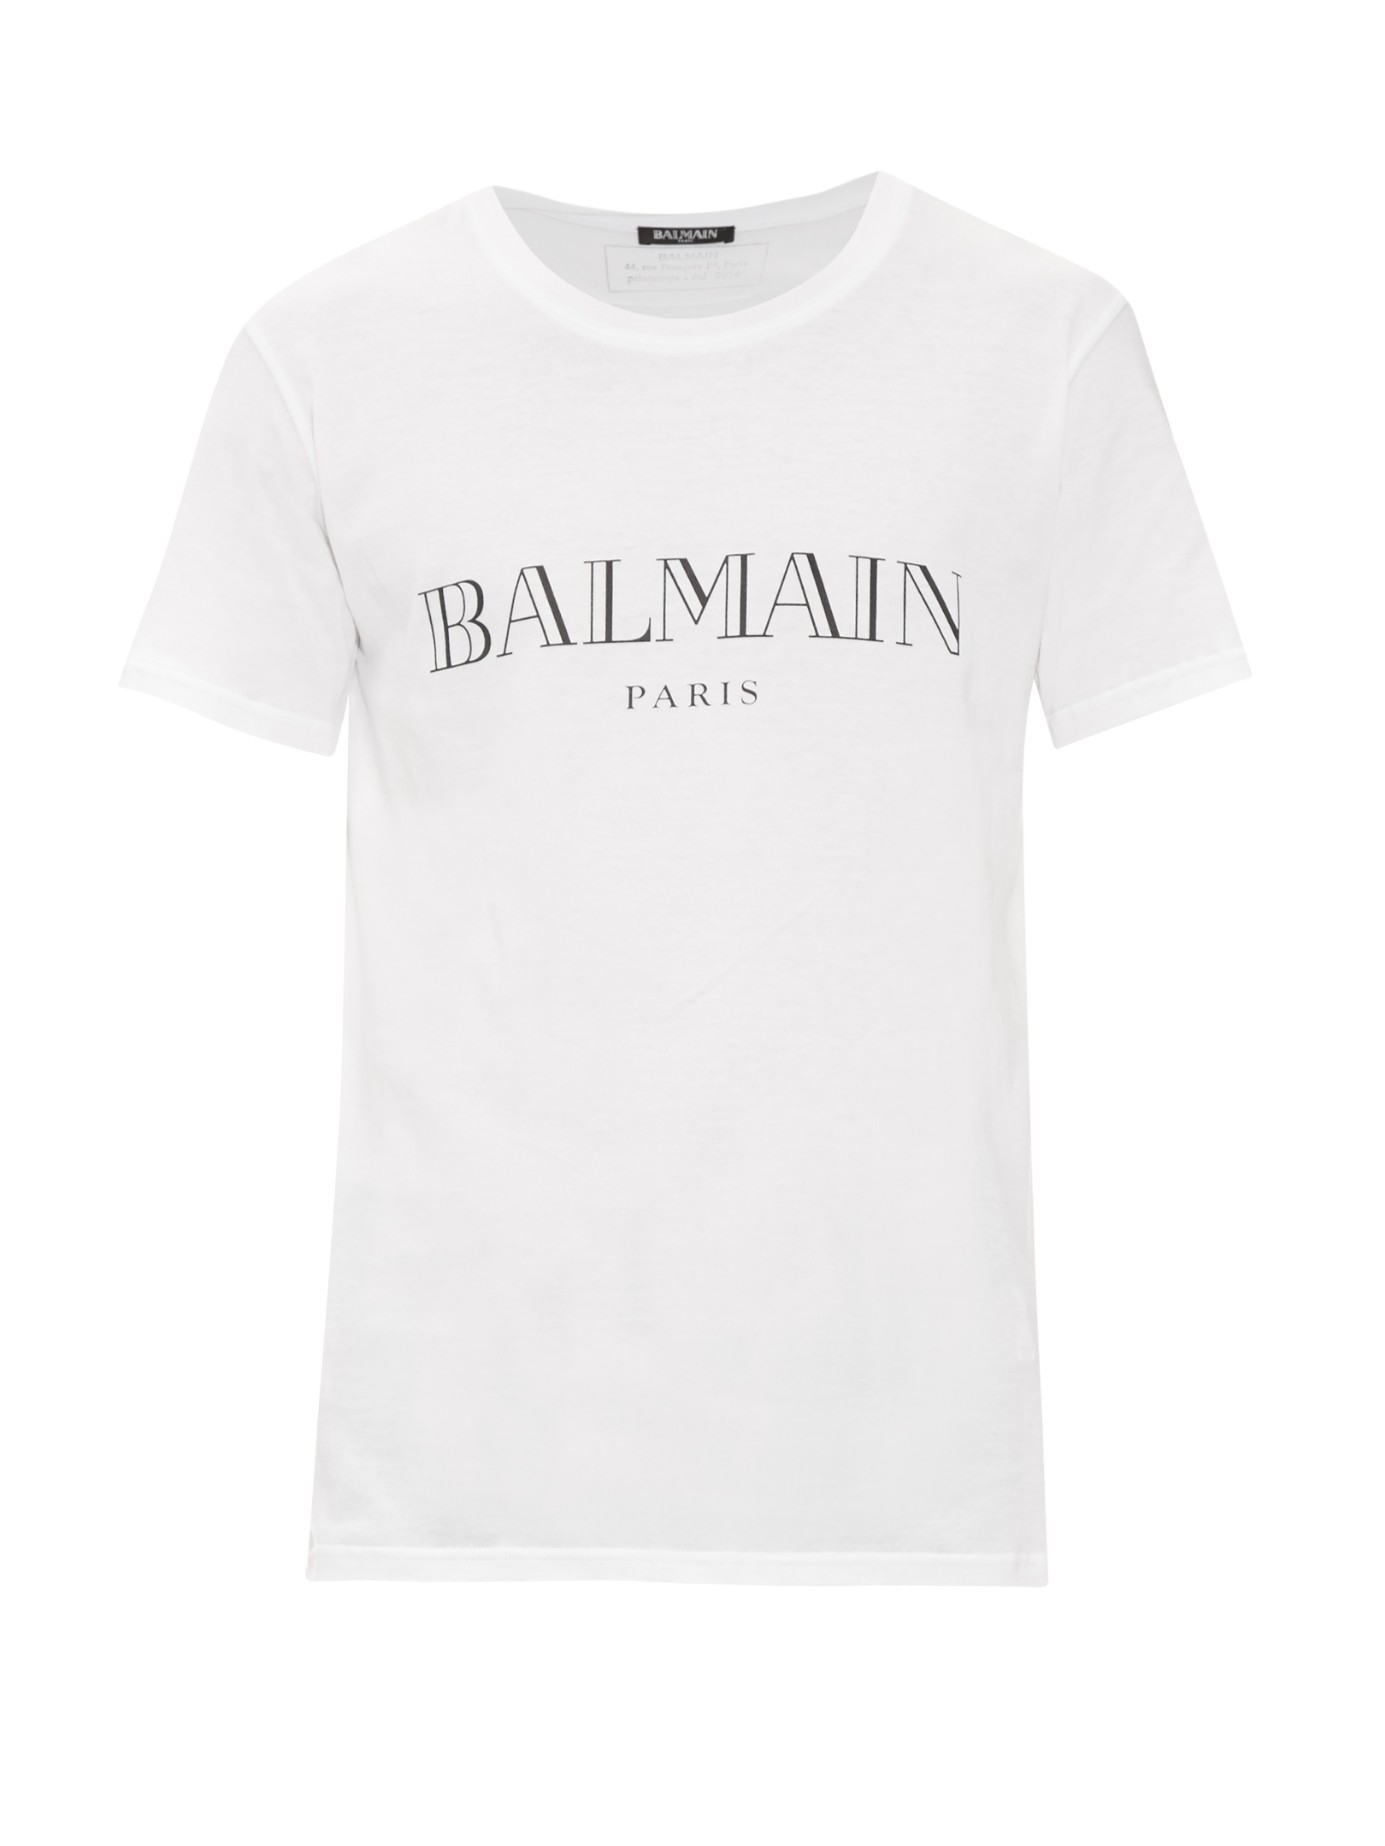 Balmain logo print cotton t shirt in white for men lyst for White t shirt printing